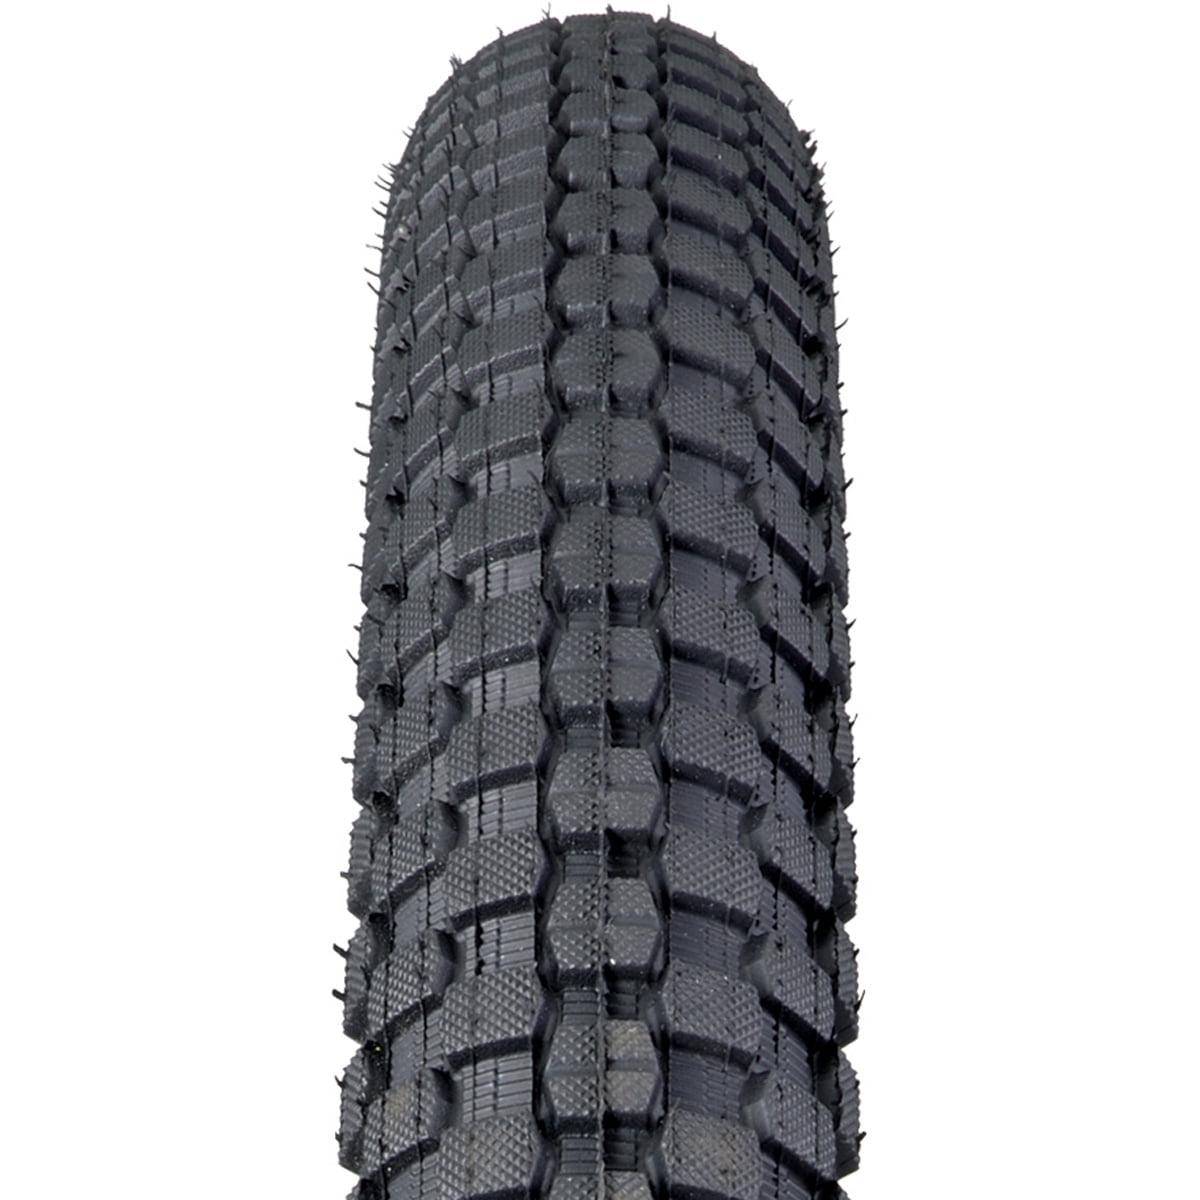 Lawn Mower Tire Tubes Walmart Wwwmiifotoscom